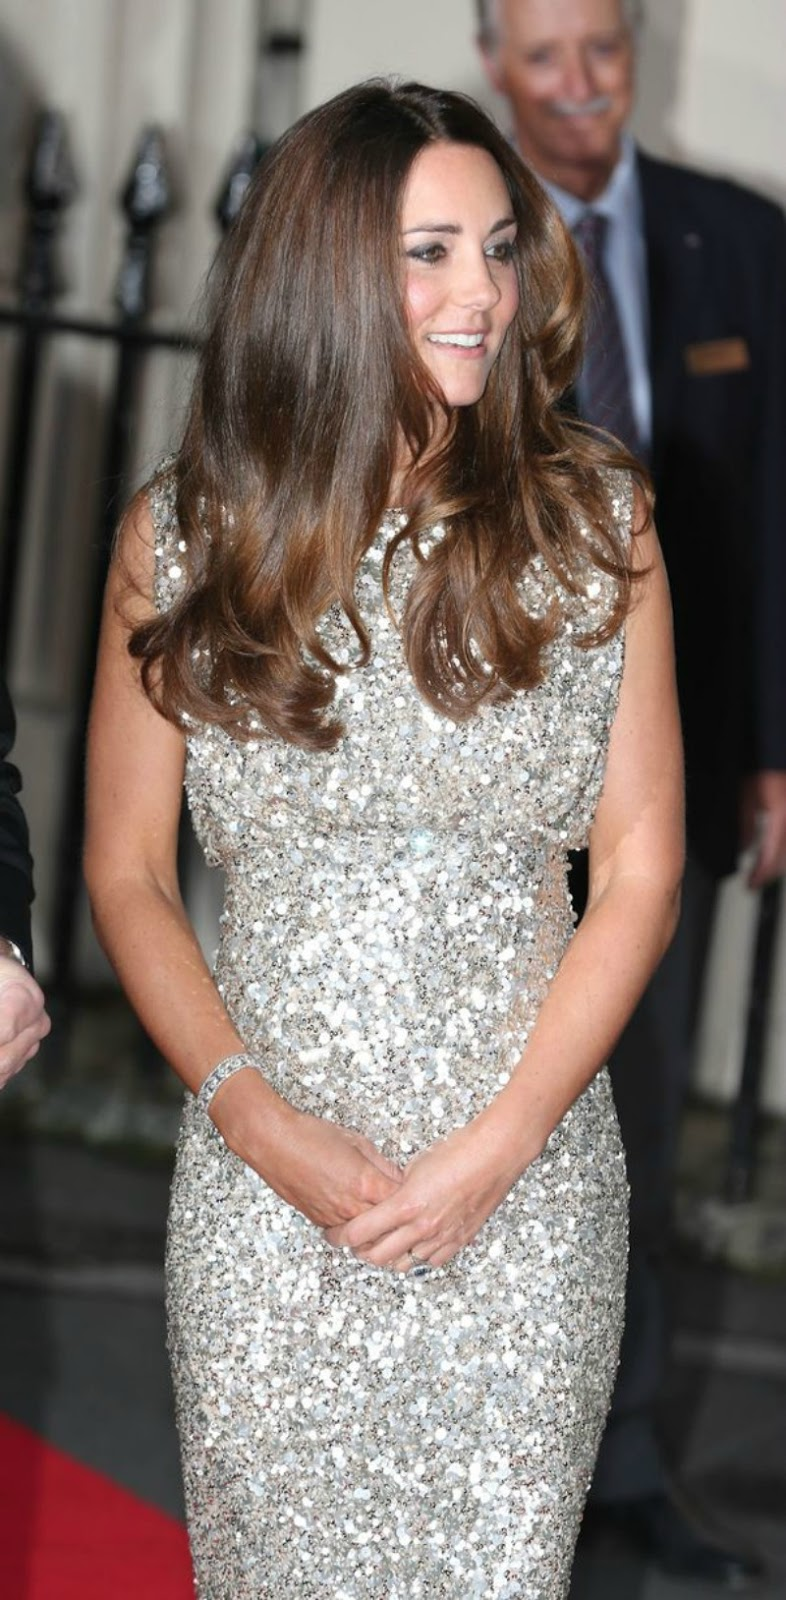 Duchess-of-Cambridge in Jenny Peckham